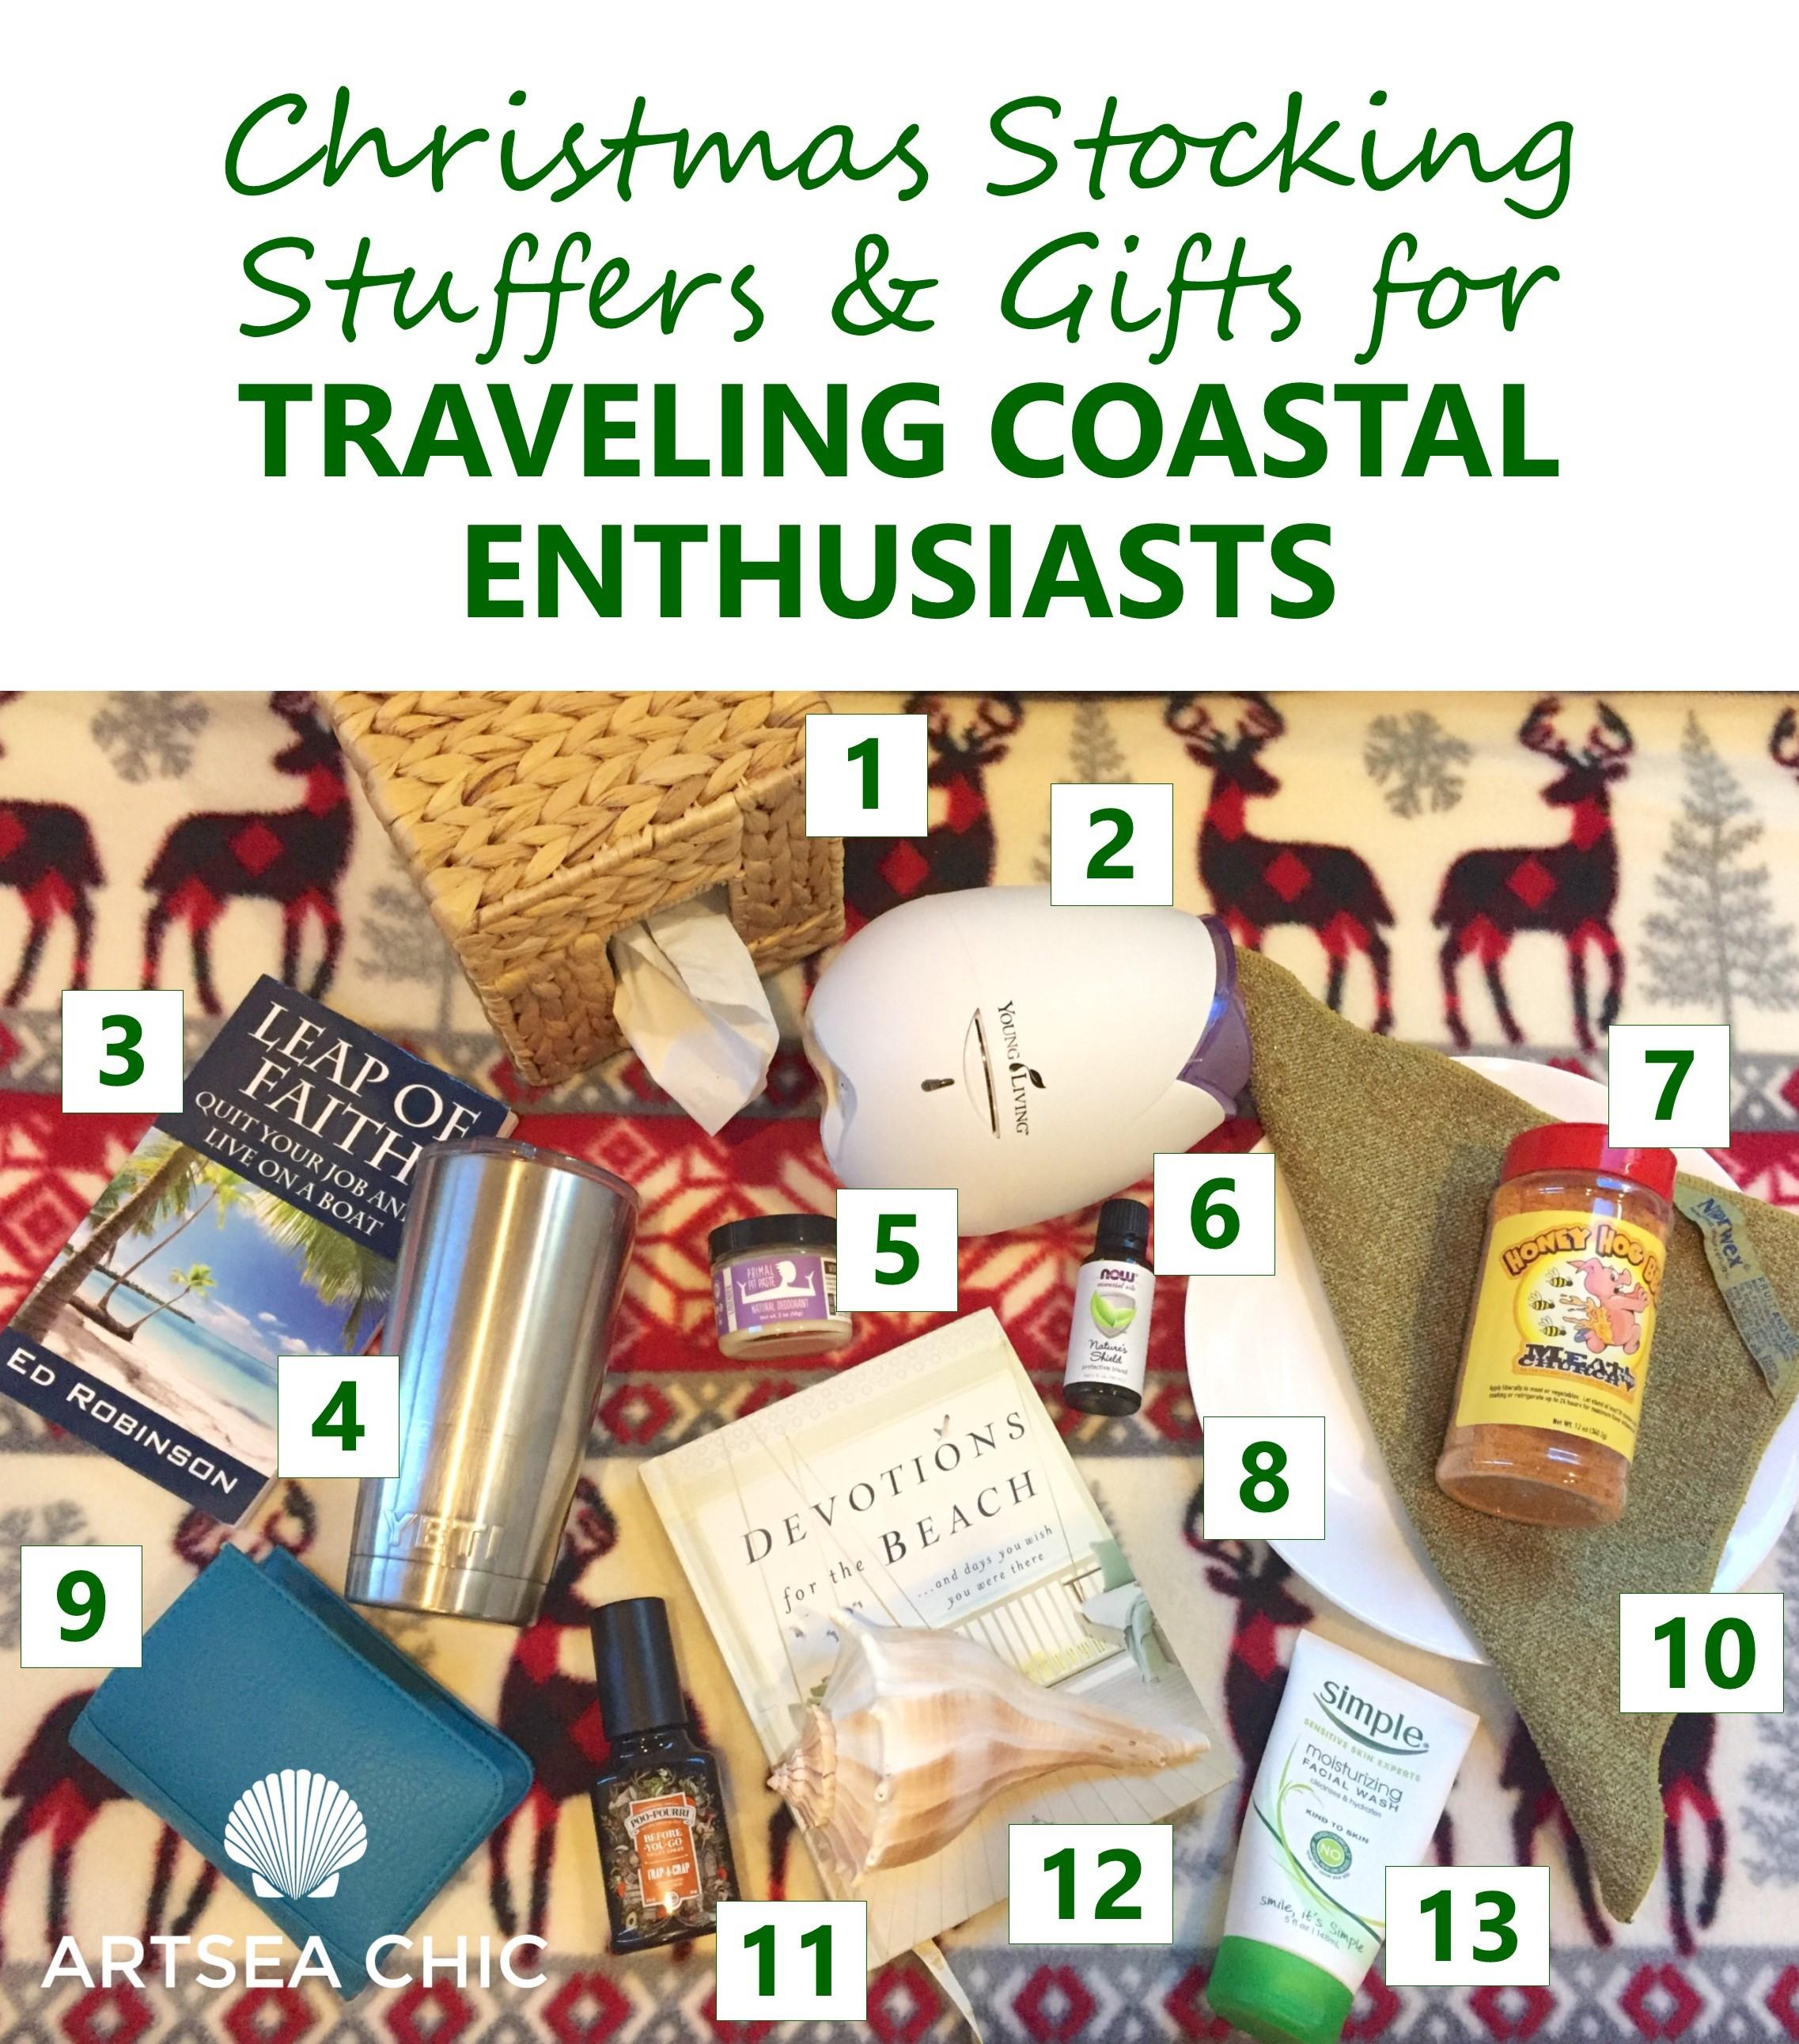 Christmas Stocking Stuffers and Gifts